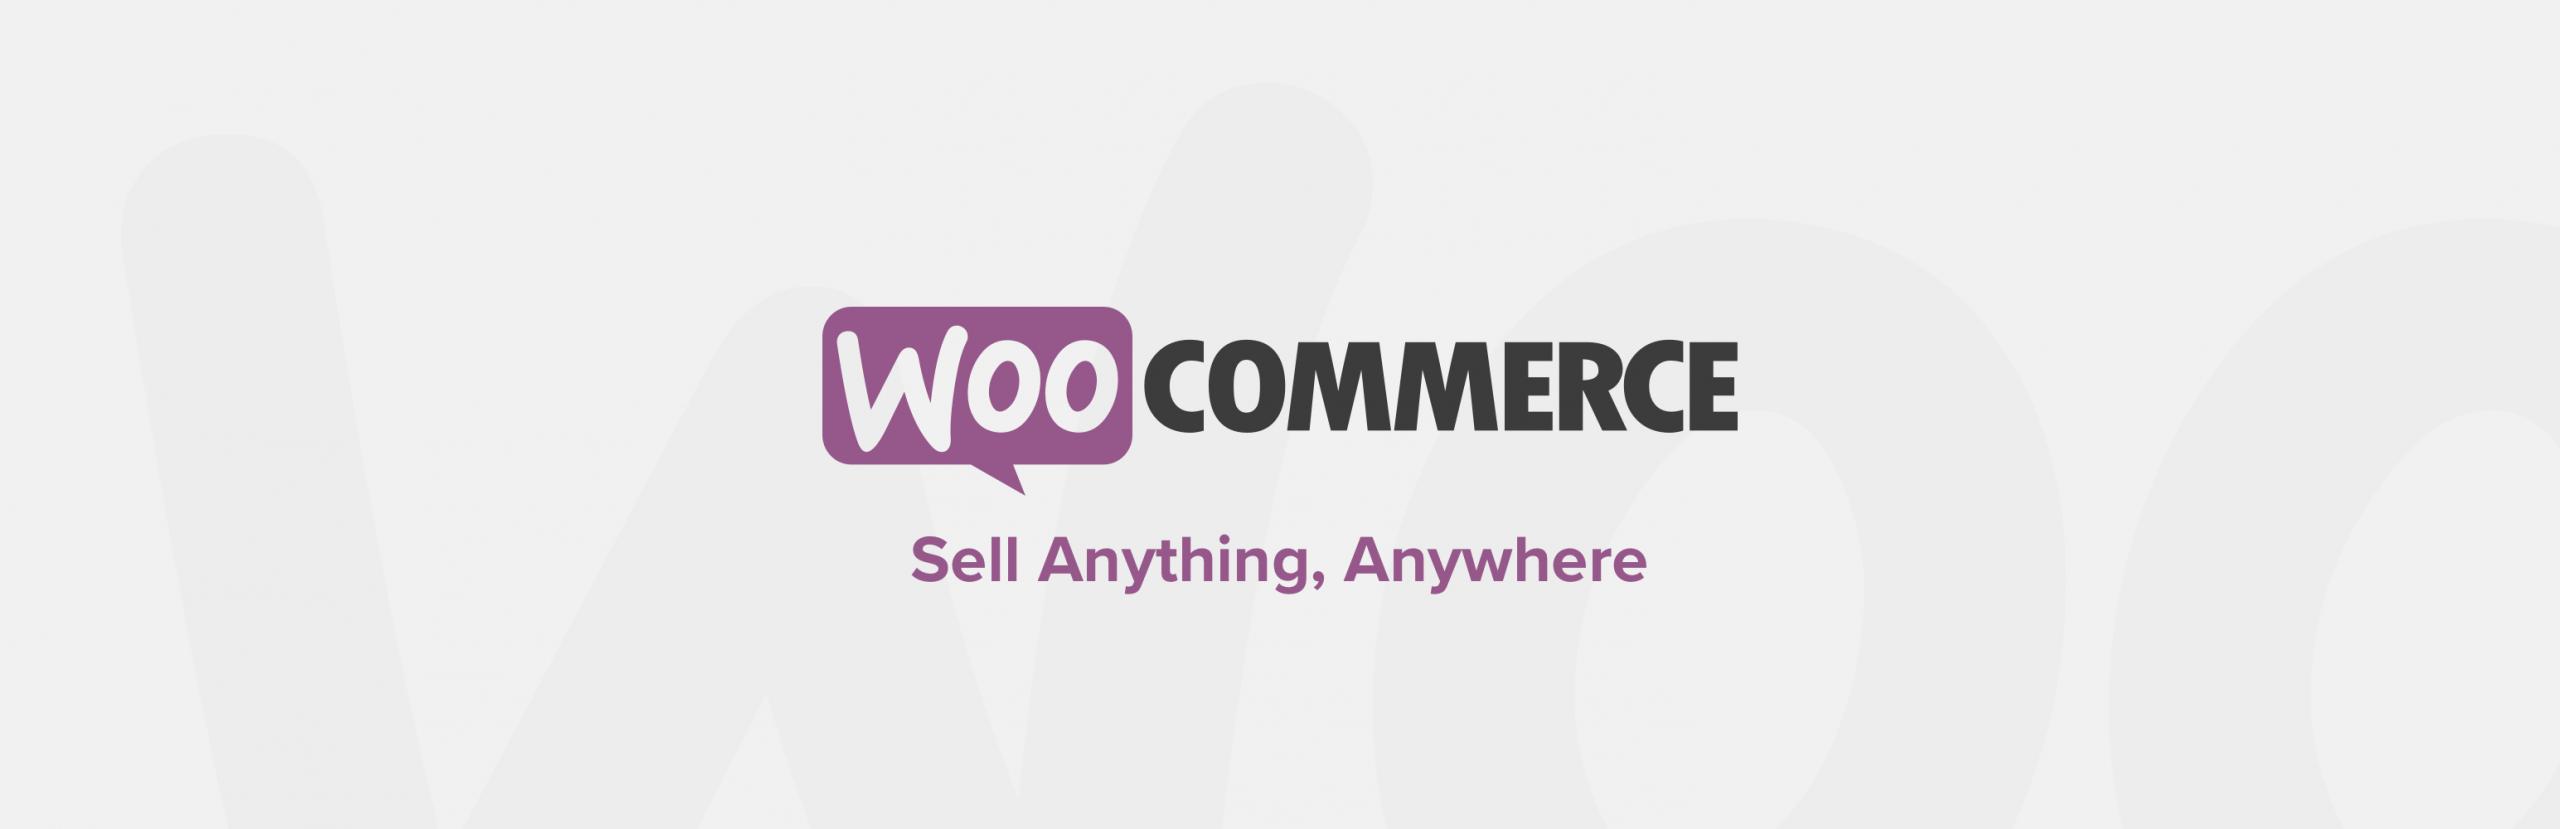 woocommerce-banner-1544x500